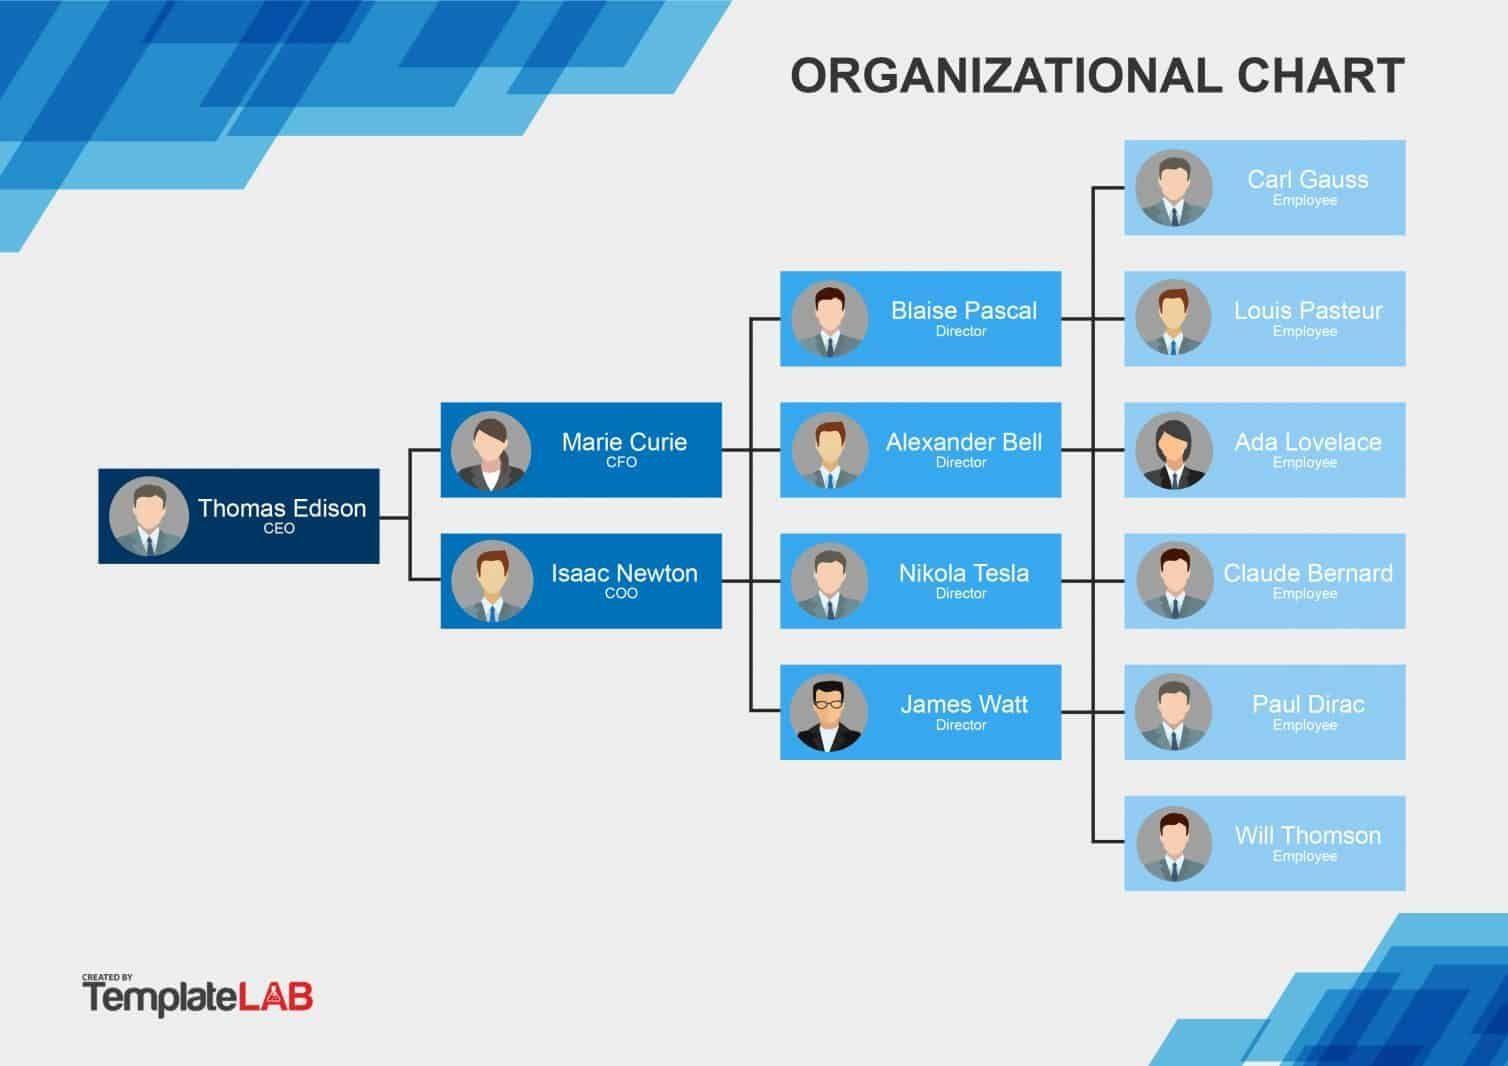 002 Marvelou Microsoft Organizational Chart Template High Resolution  Templates Visio Org M Office Organization PowerpointFull